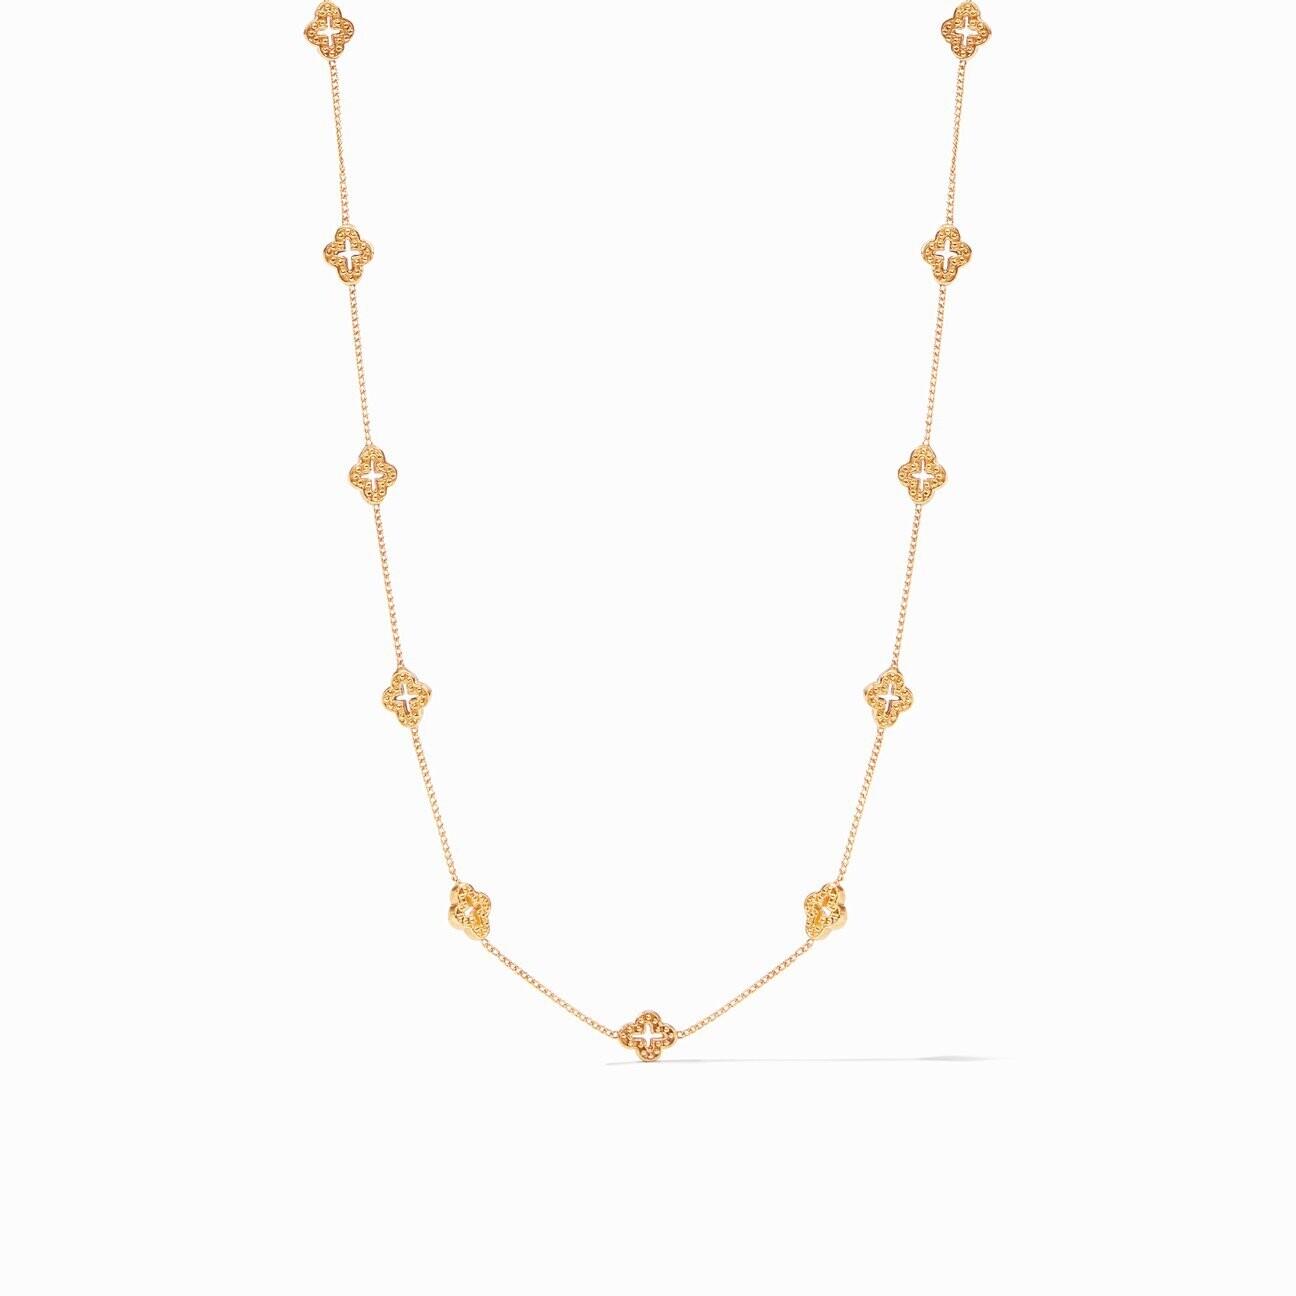 JULIE VOS Florentine Demi-Delicate Necklace